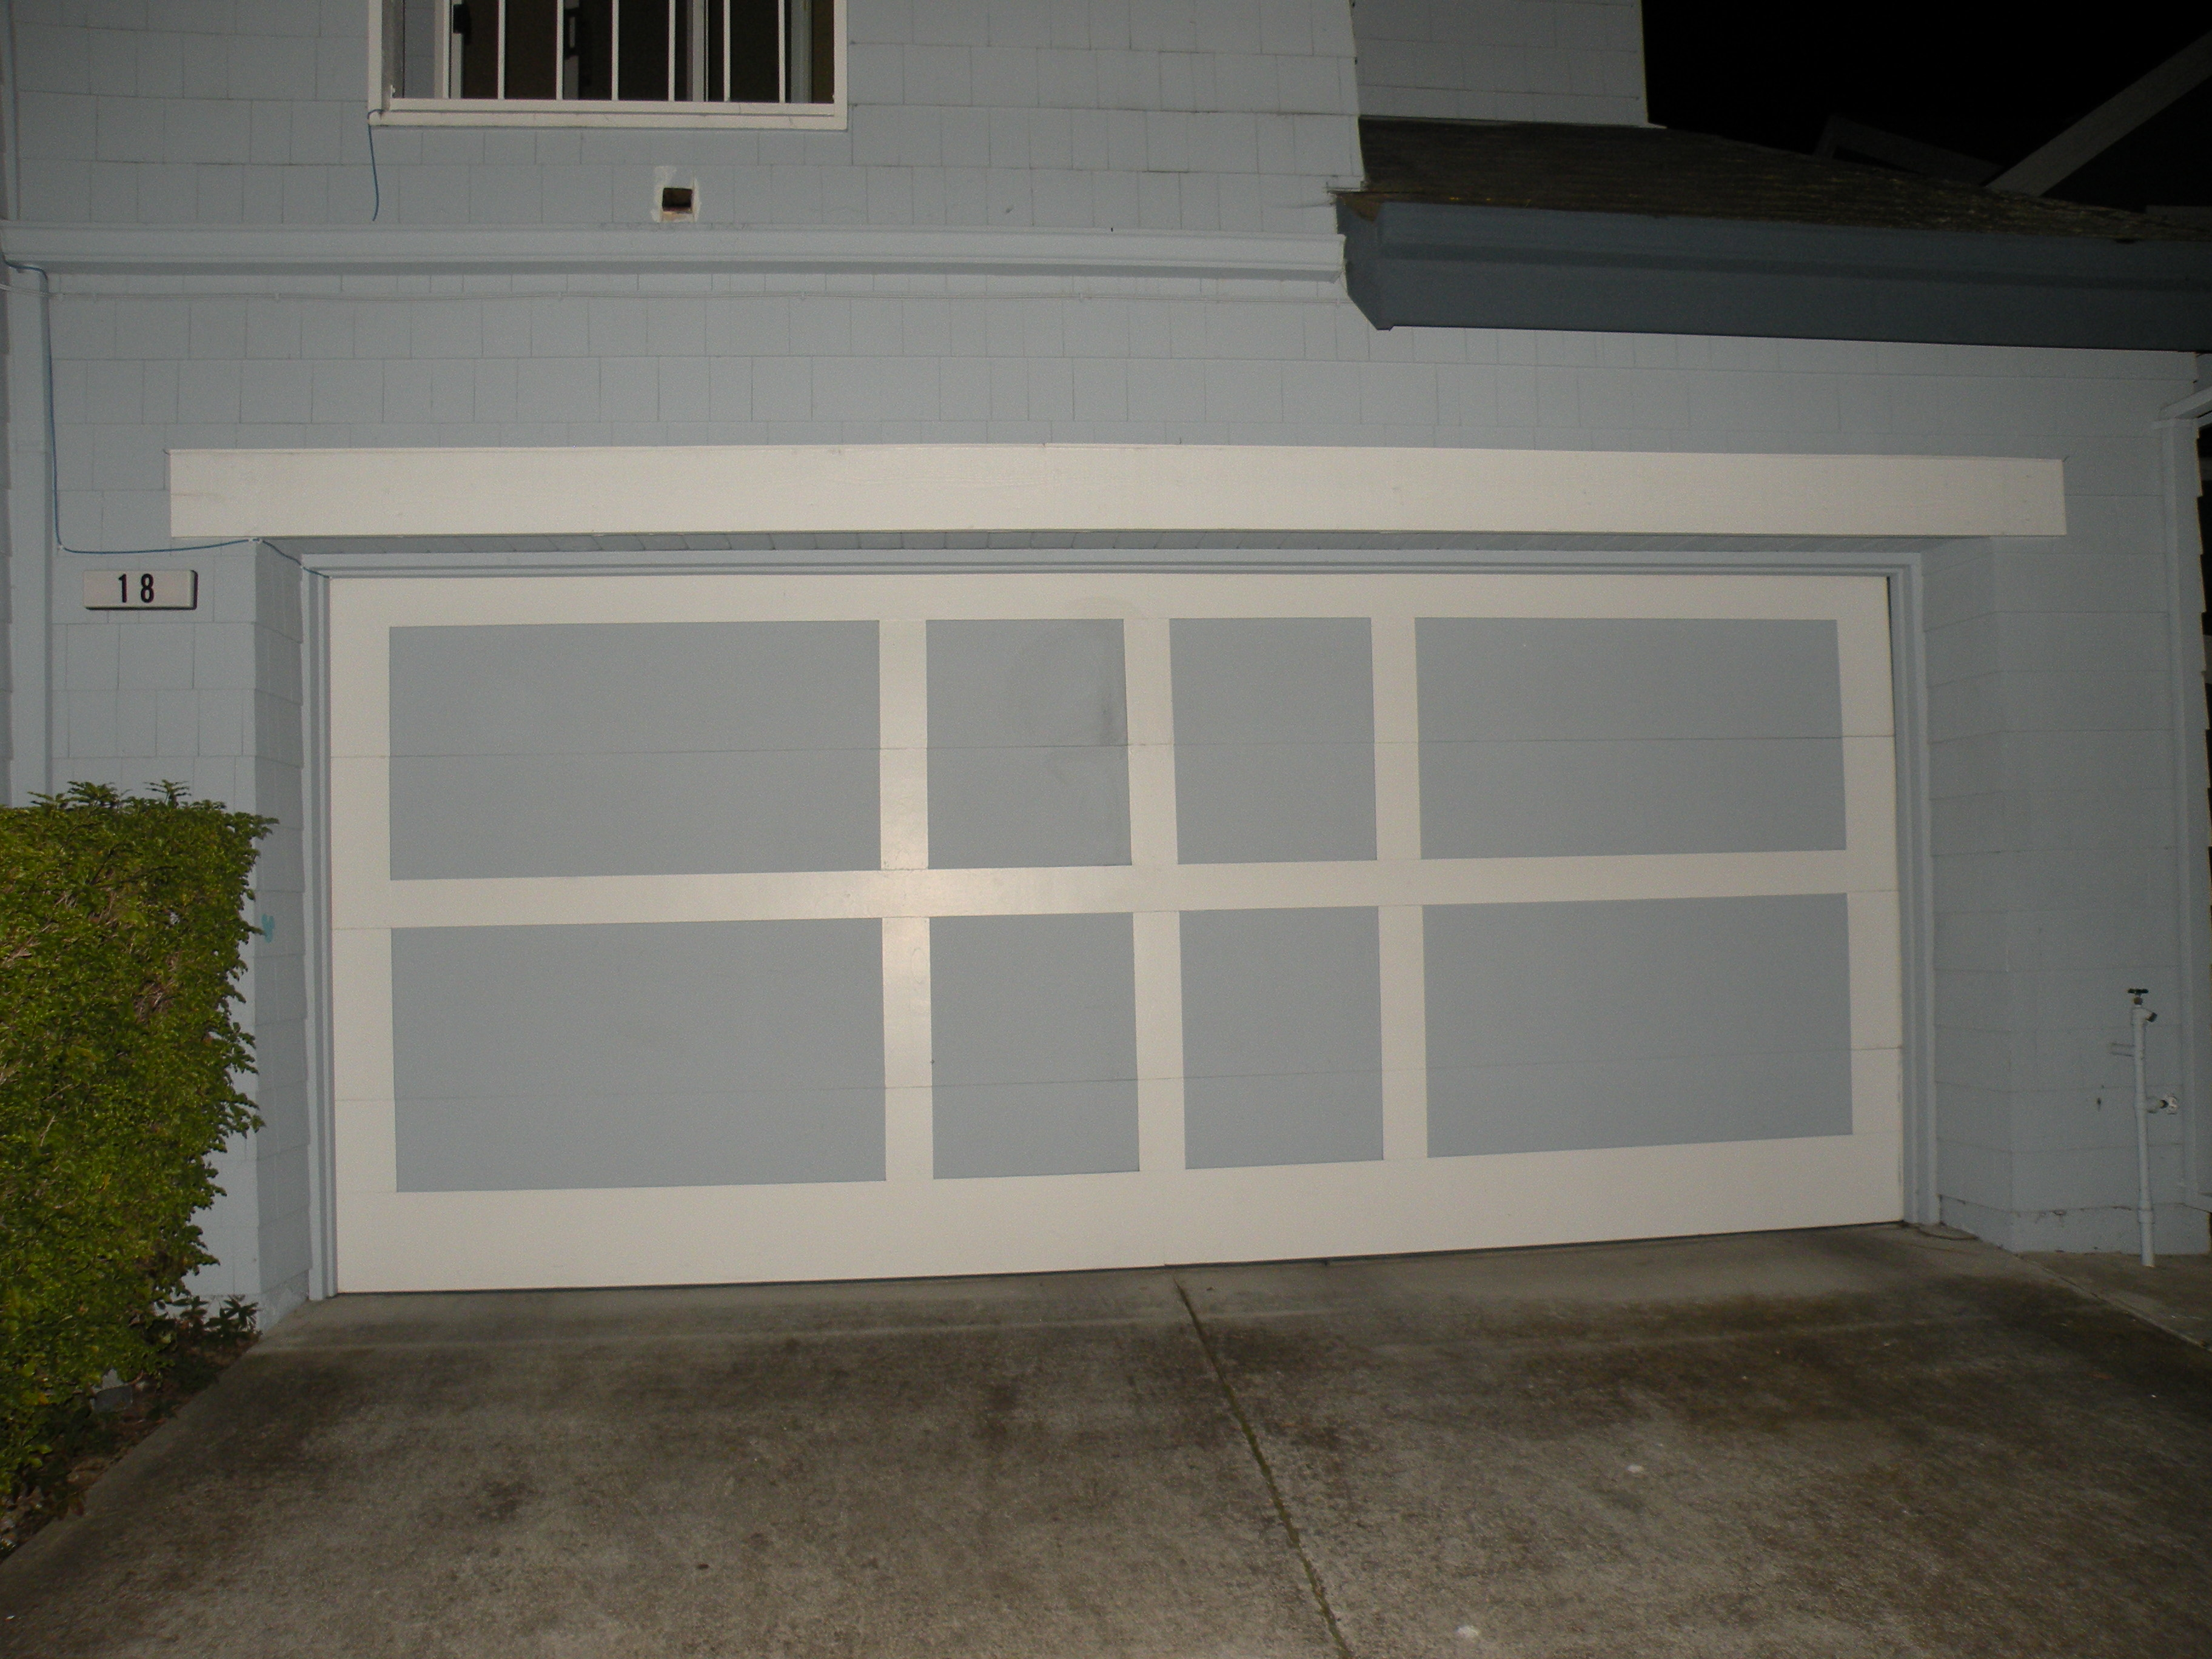 911 garage door repair san jose image 3